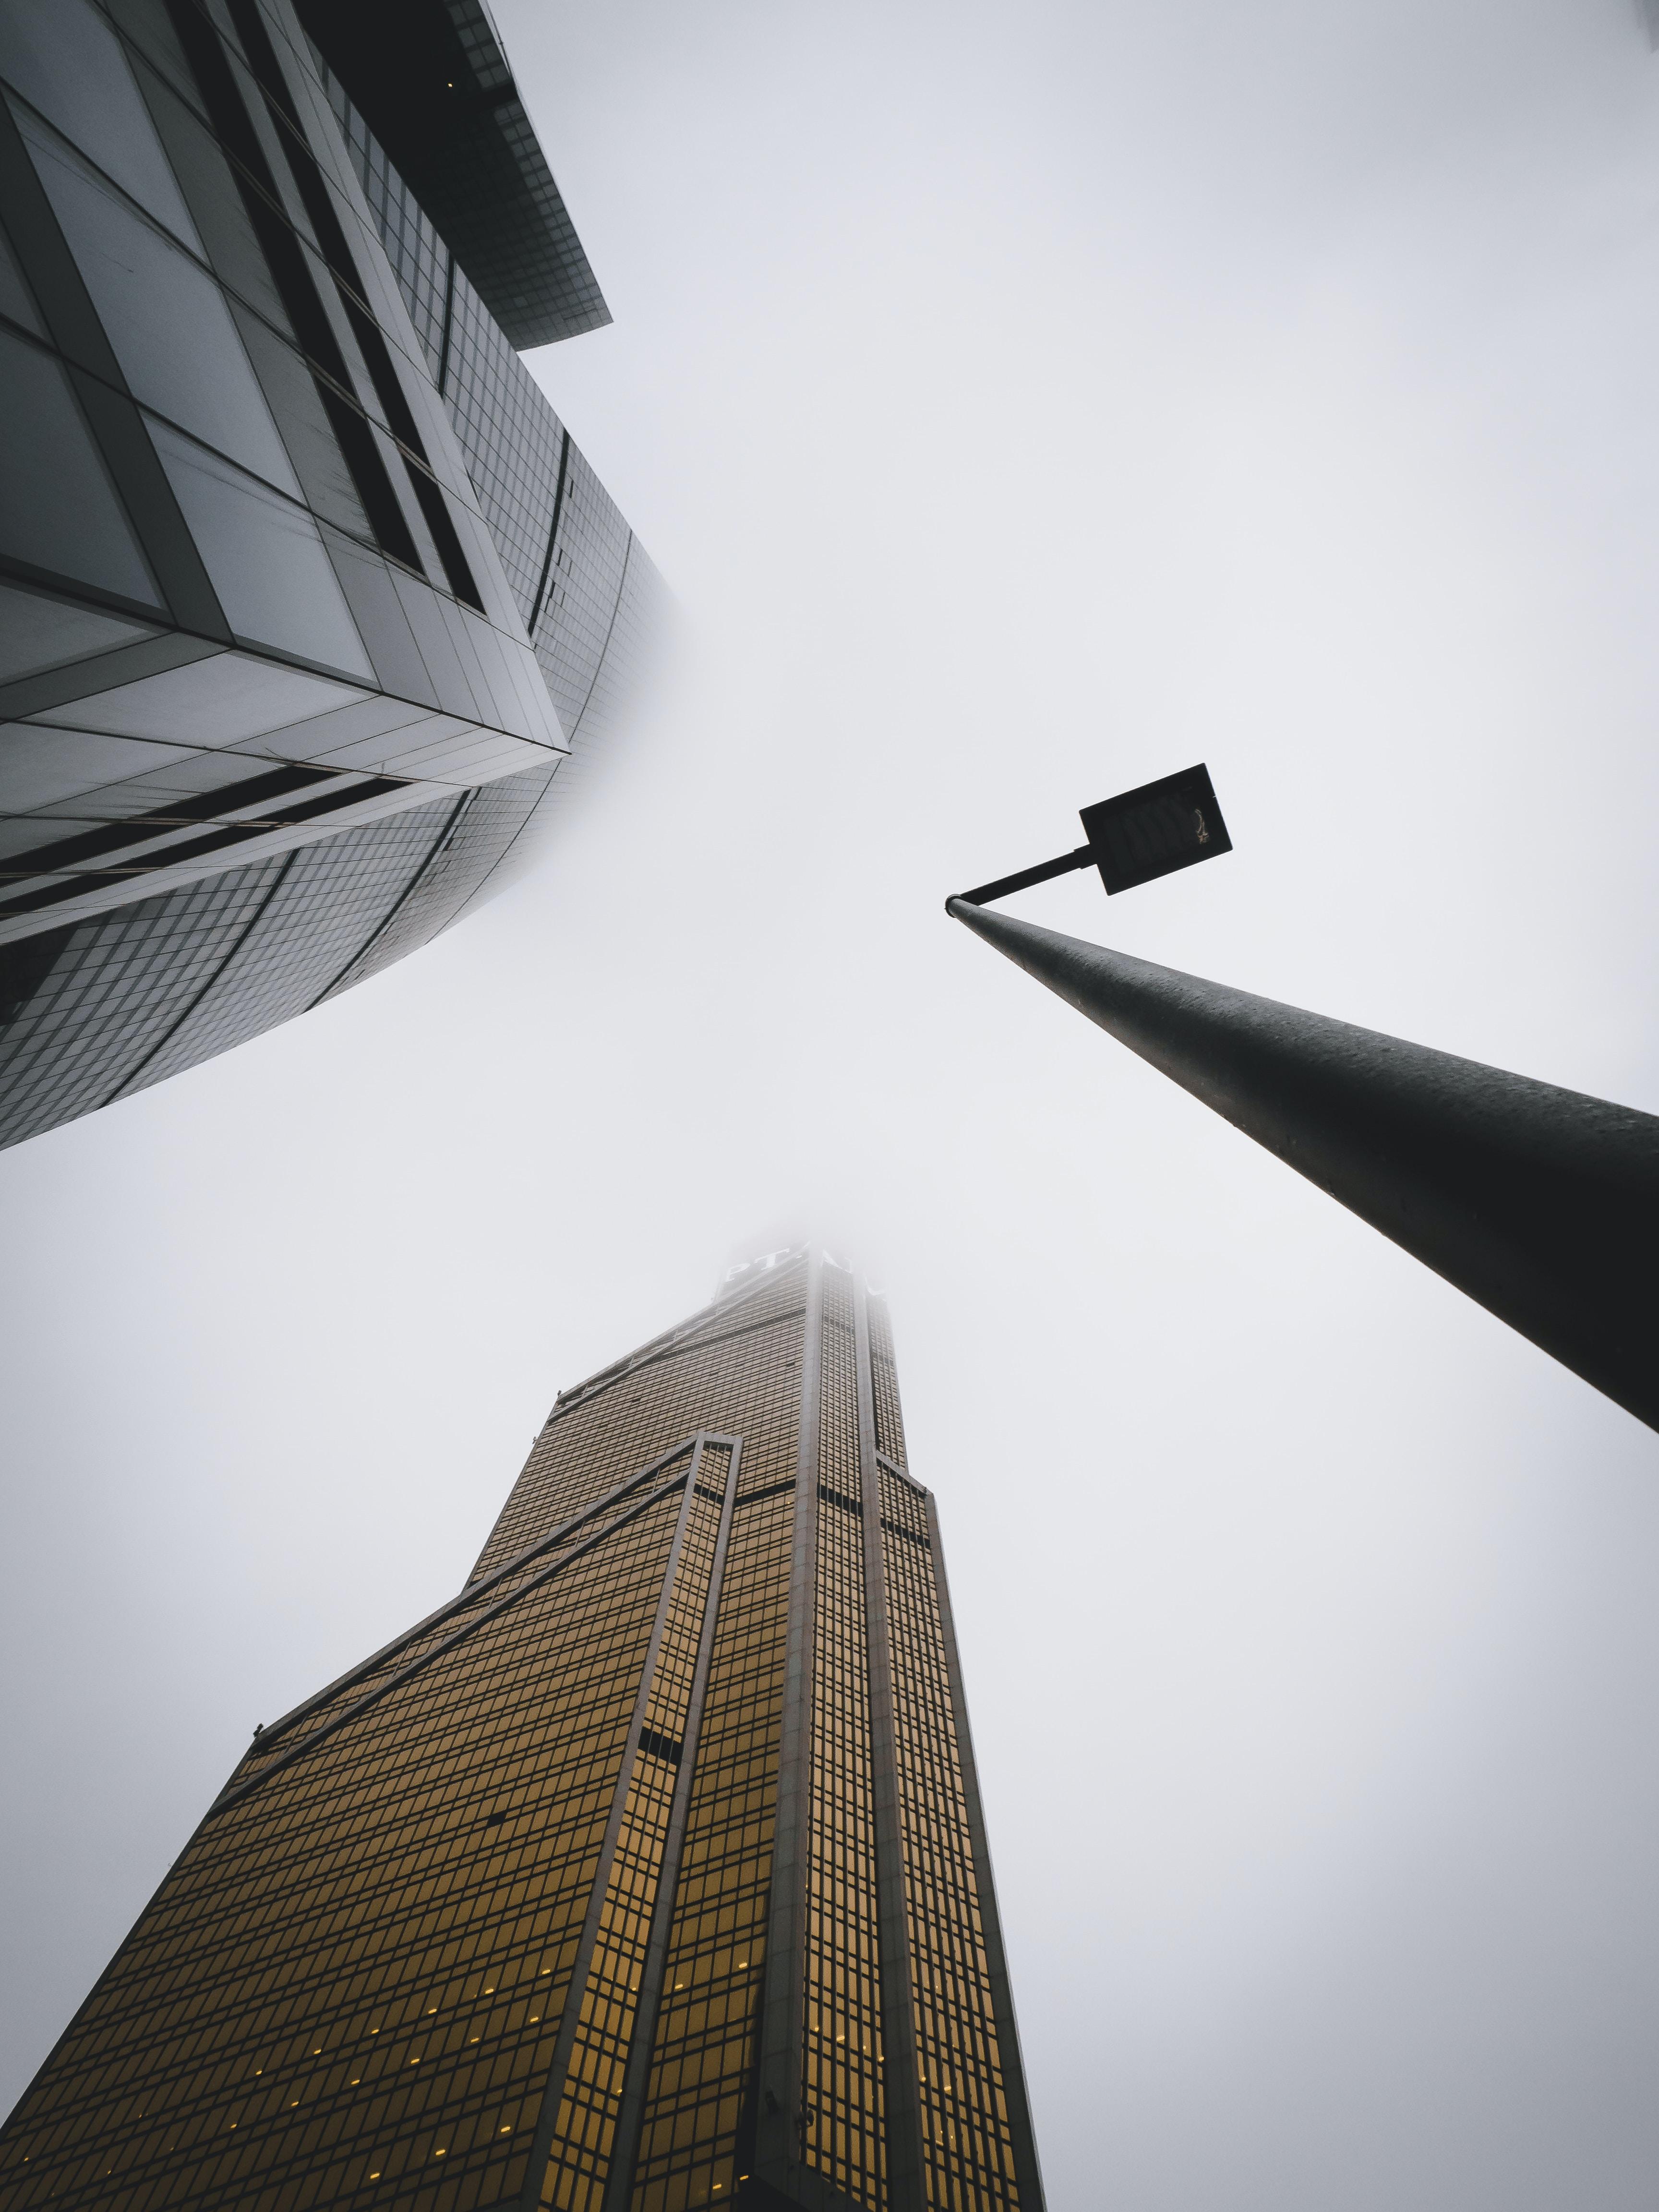 street light near city buildings under gray sky during daytime